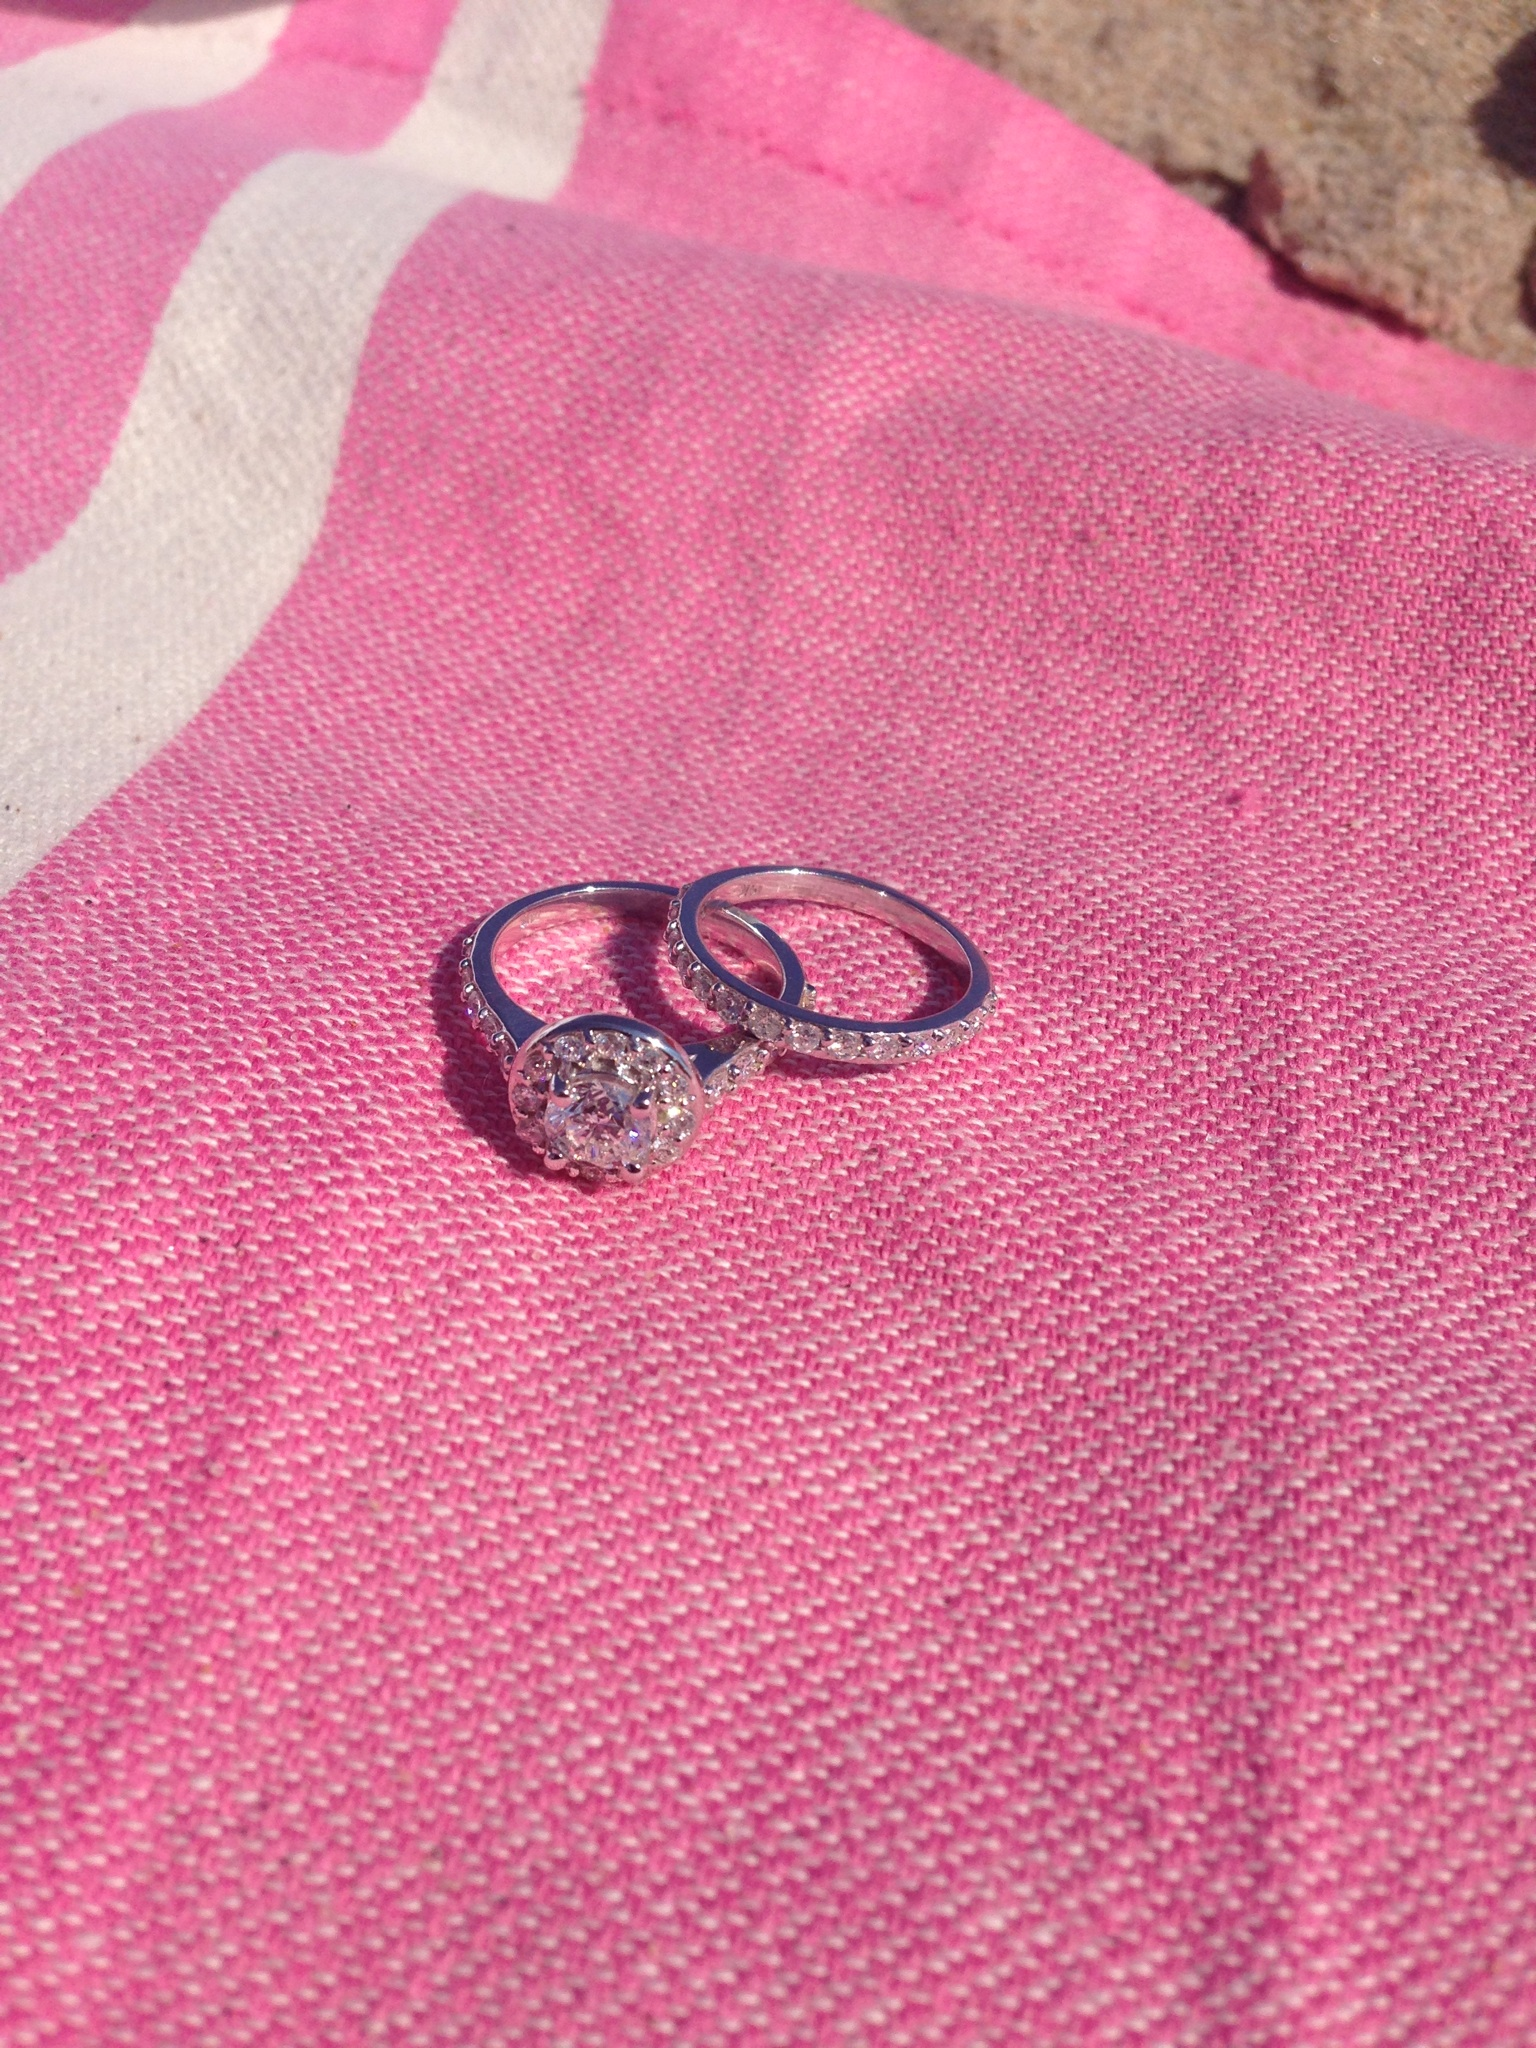 Original round center engagement ring reset into new halo design